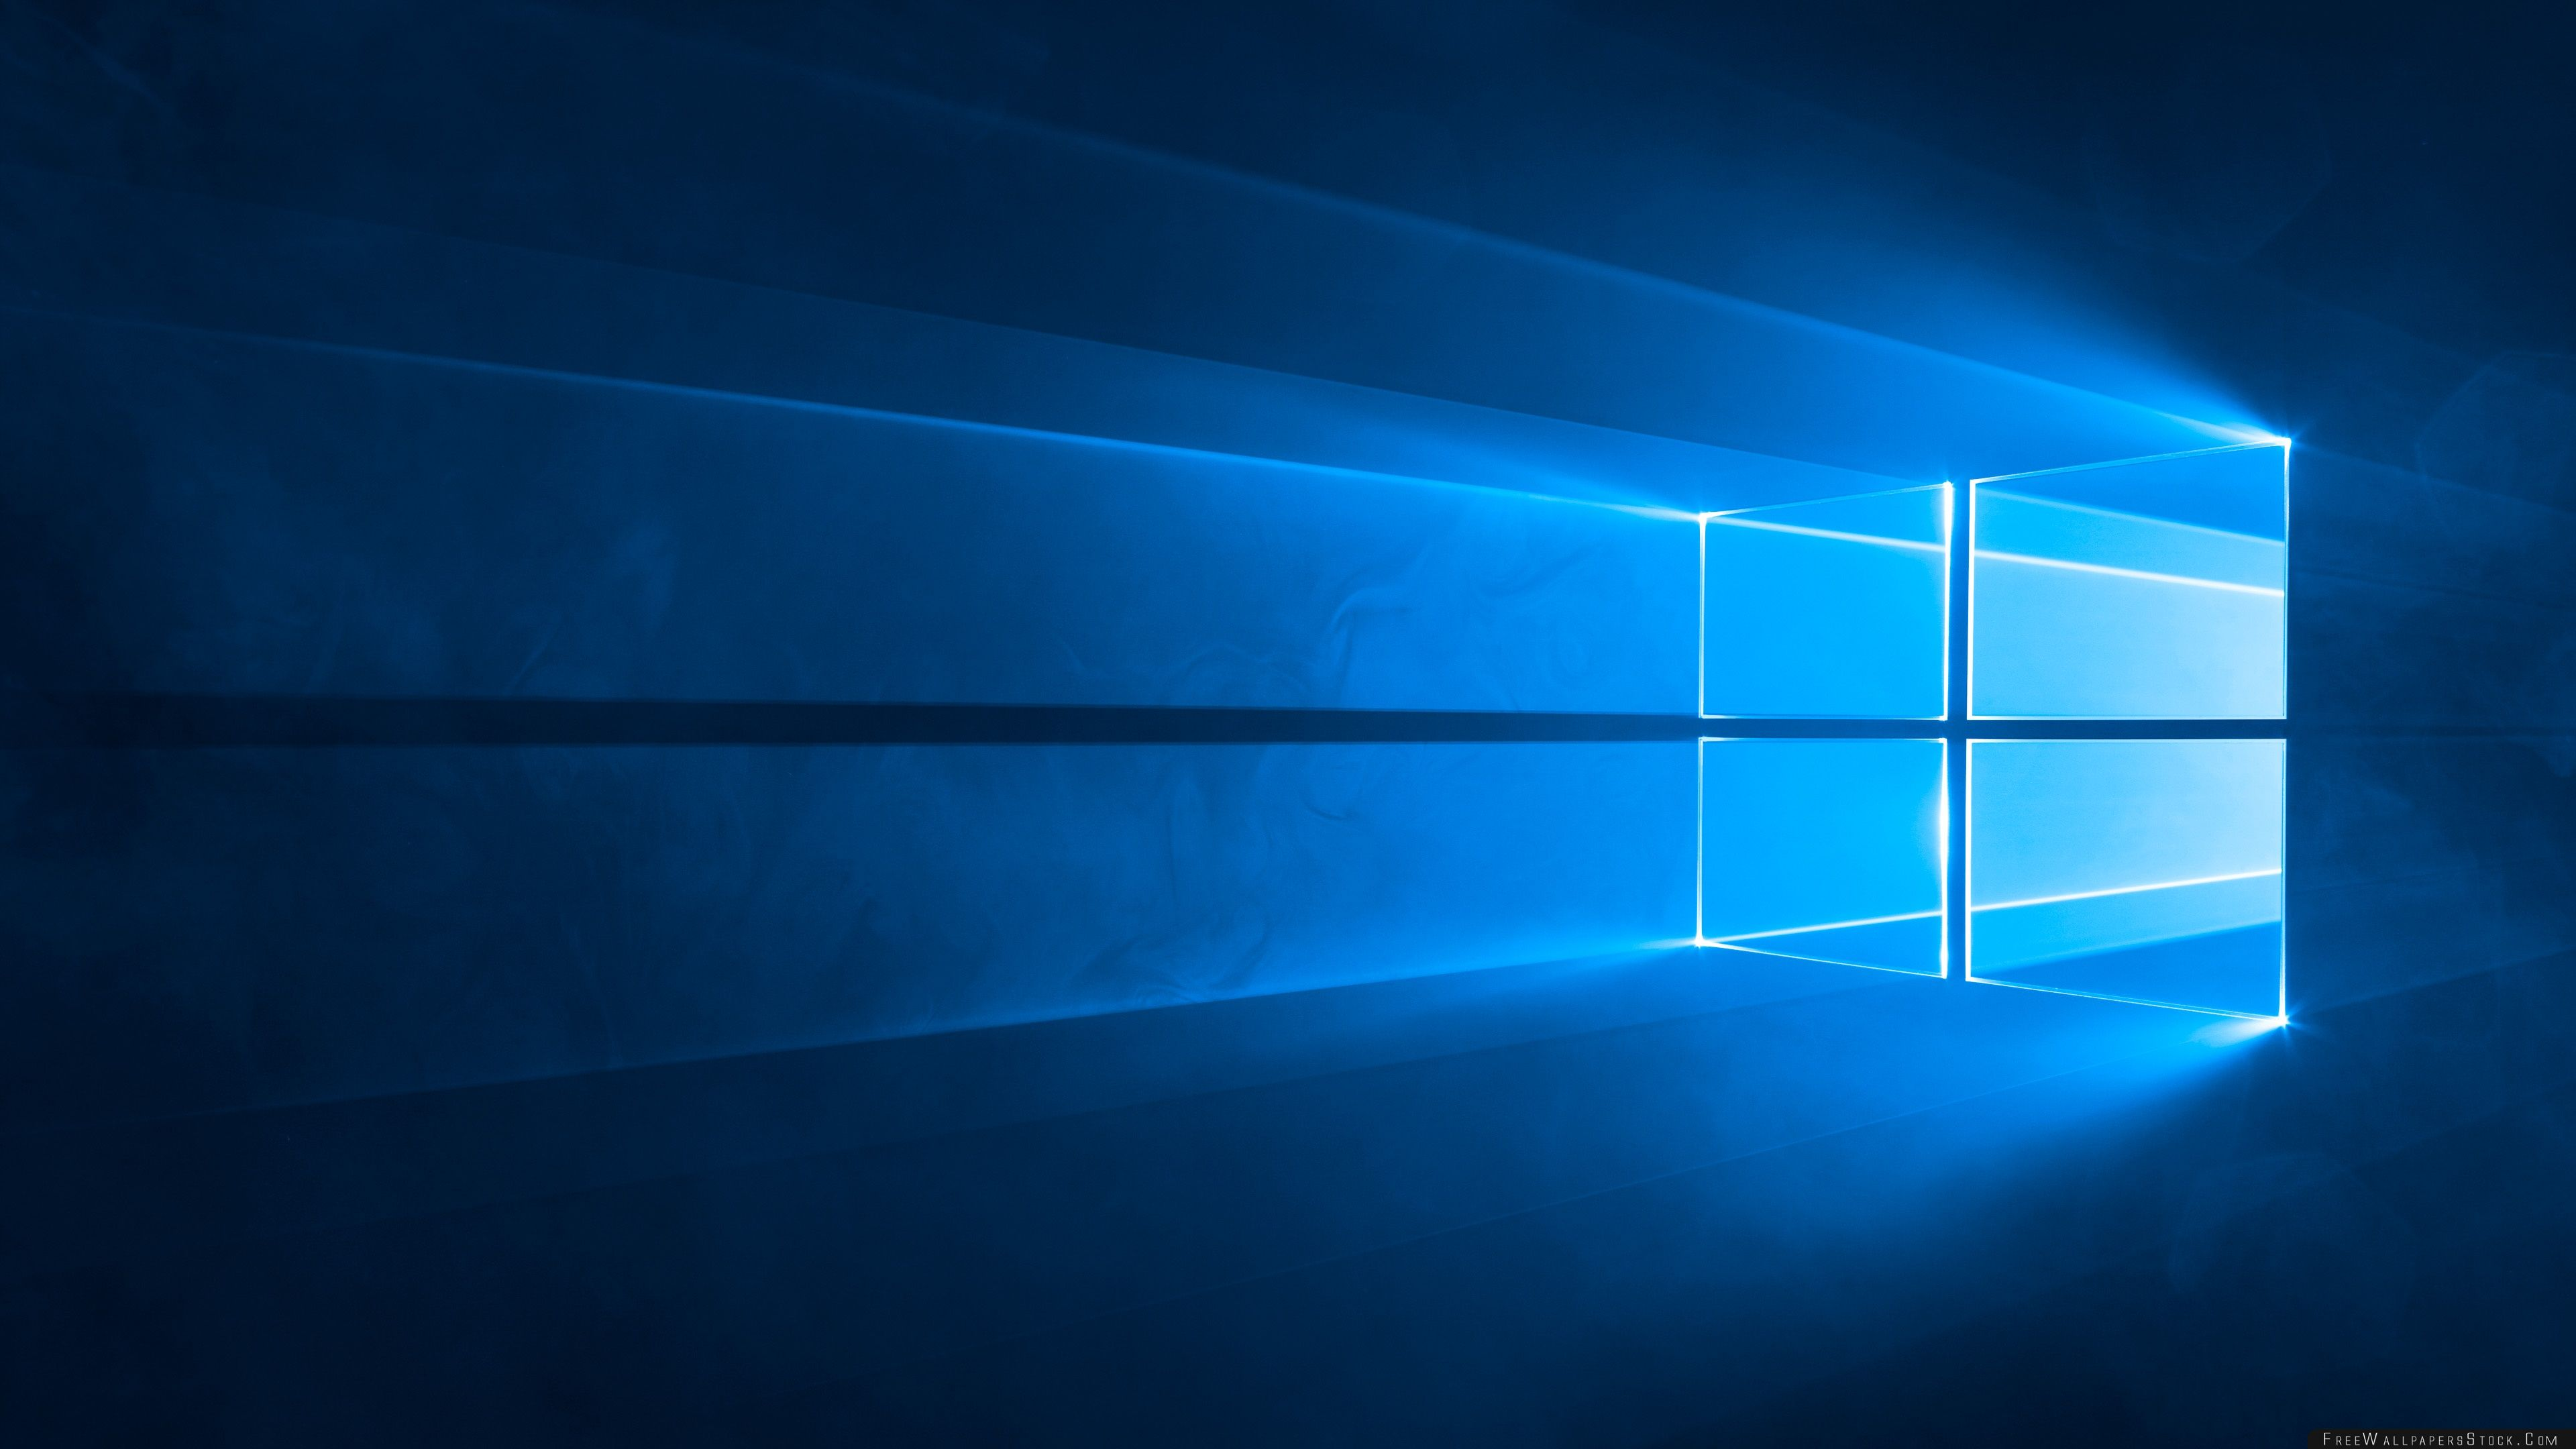 Download Free Wallpaper Windows Hero